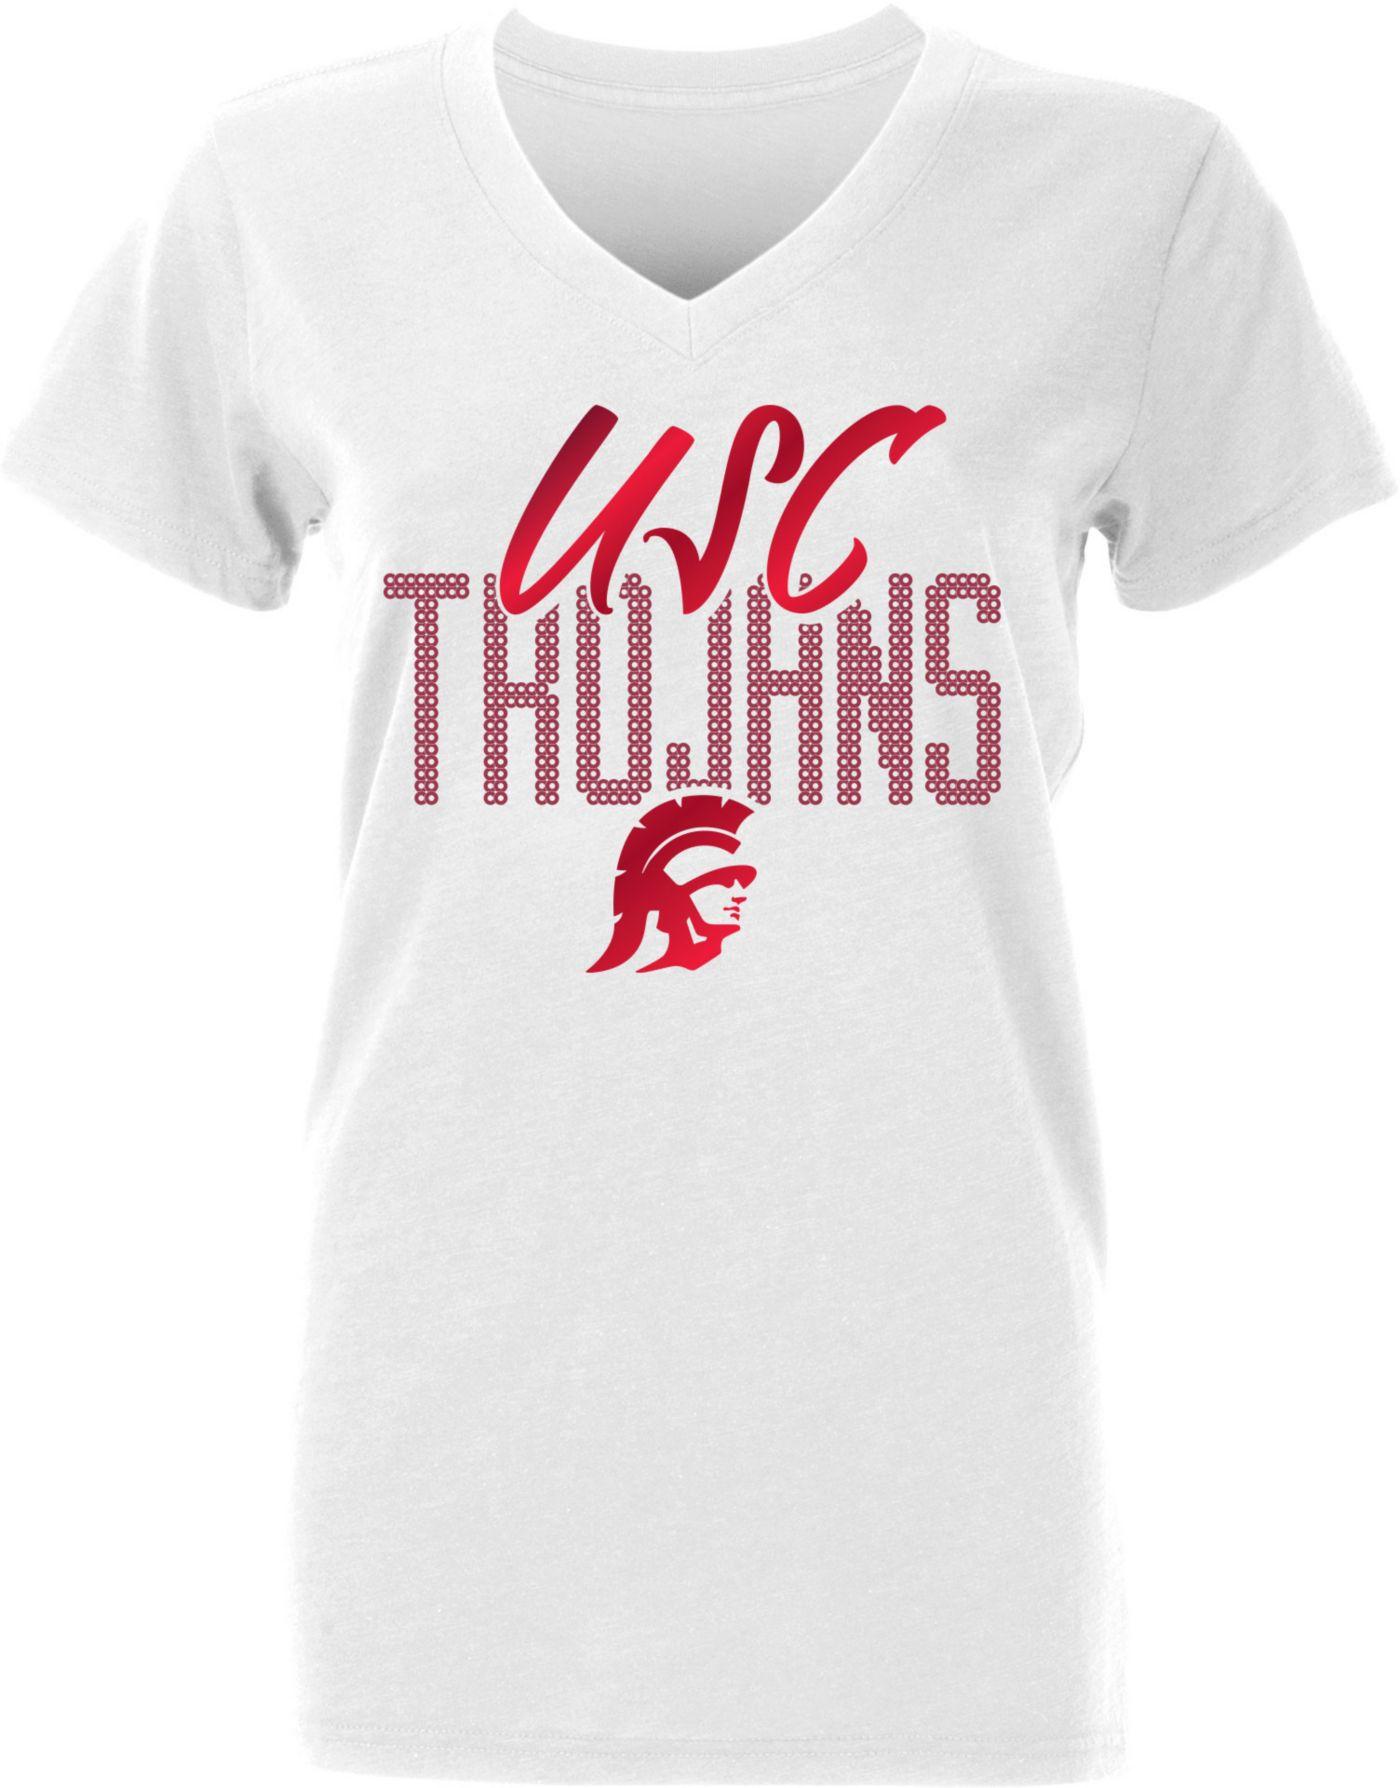 USC Authentic Apparel Women's USC Trojans Aelin V-Neck White T-Shirt